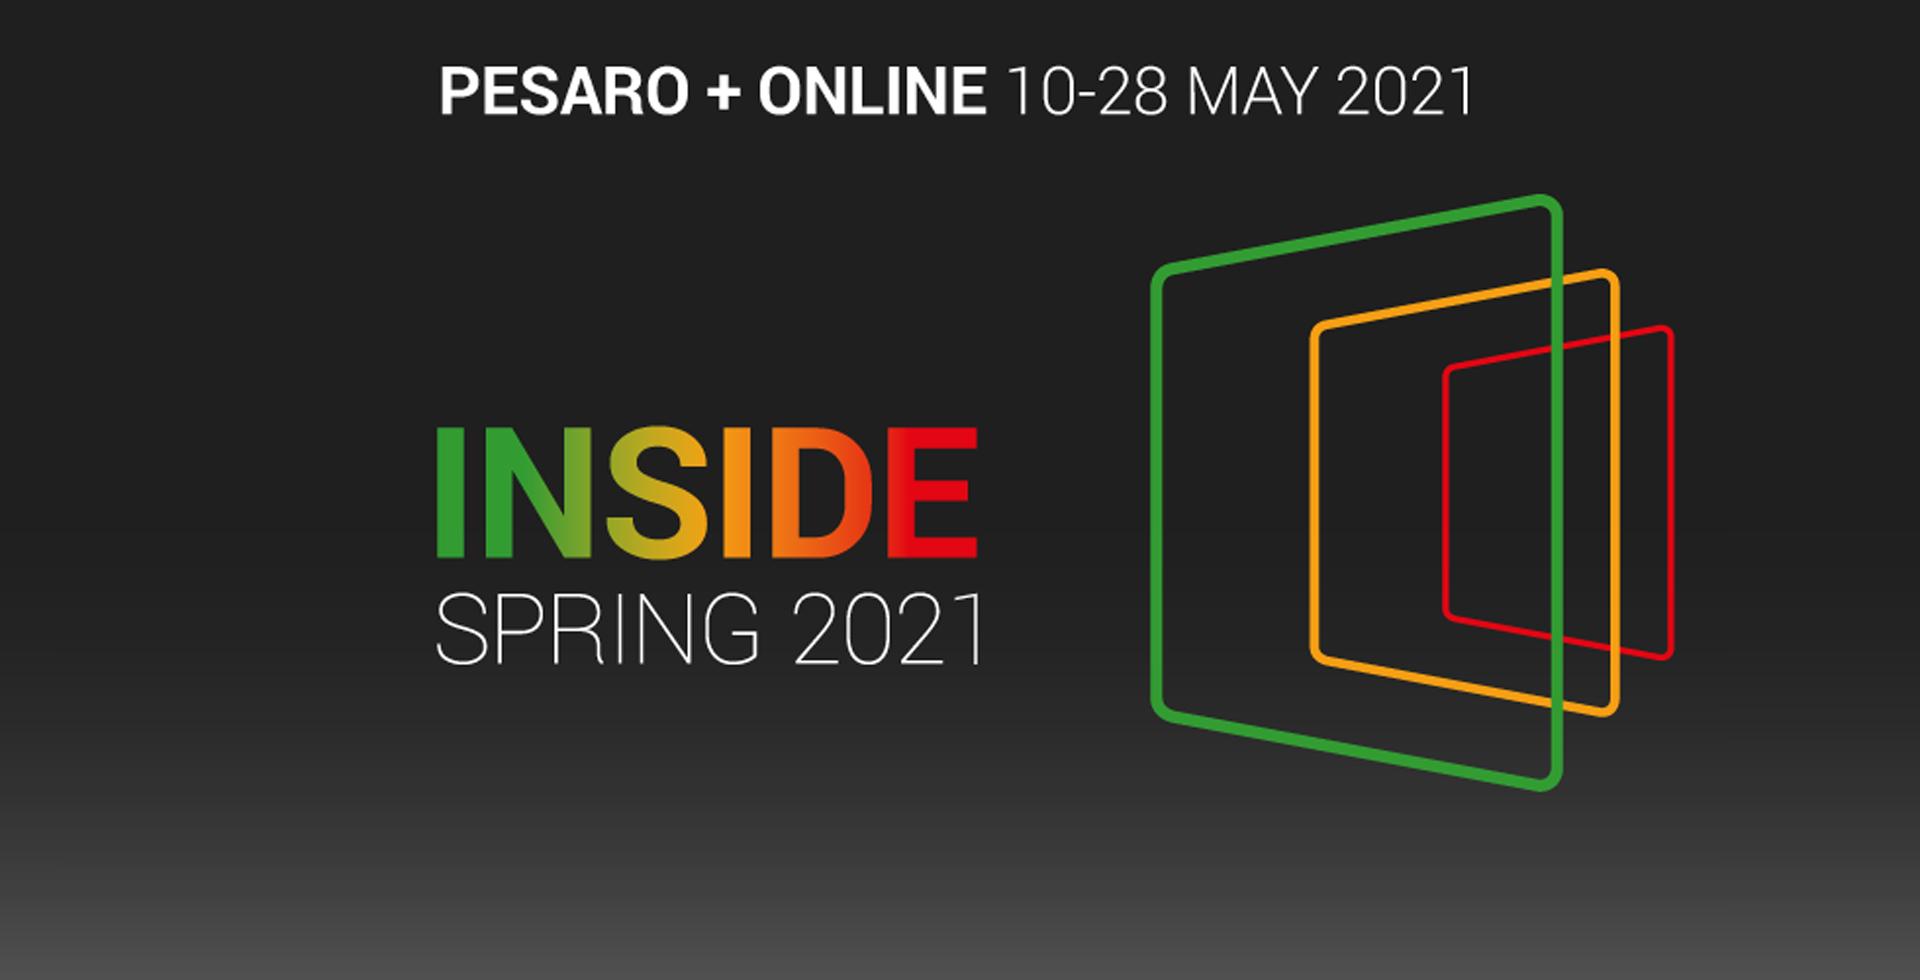 展览与活动 Inside Spring 2021, an extraordinary edition  to be experienced without boundaries.: 照片 1